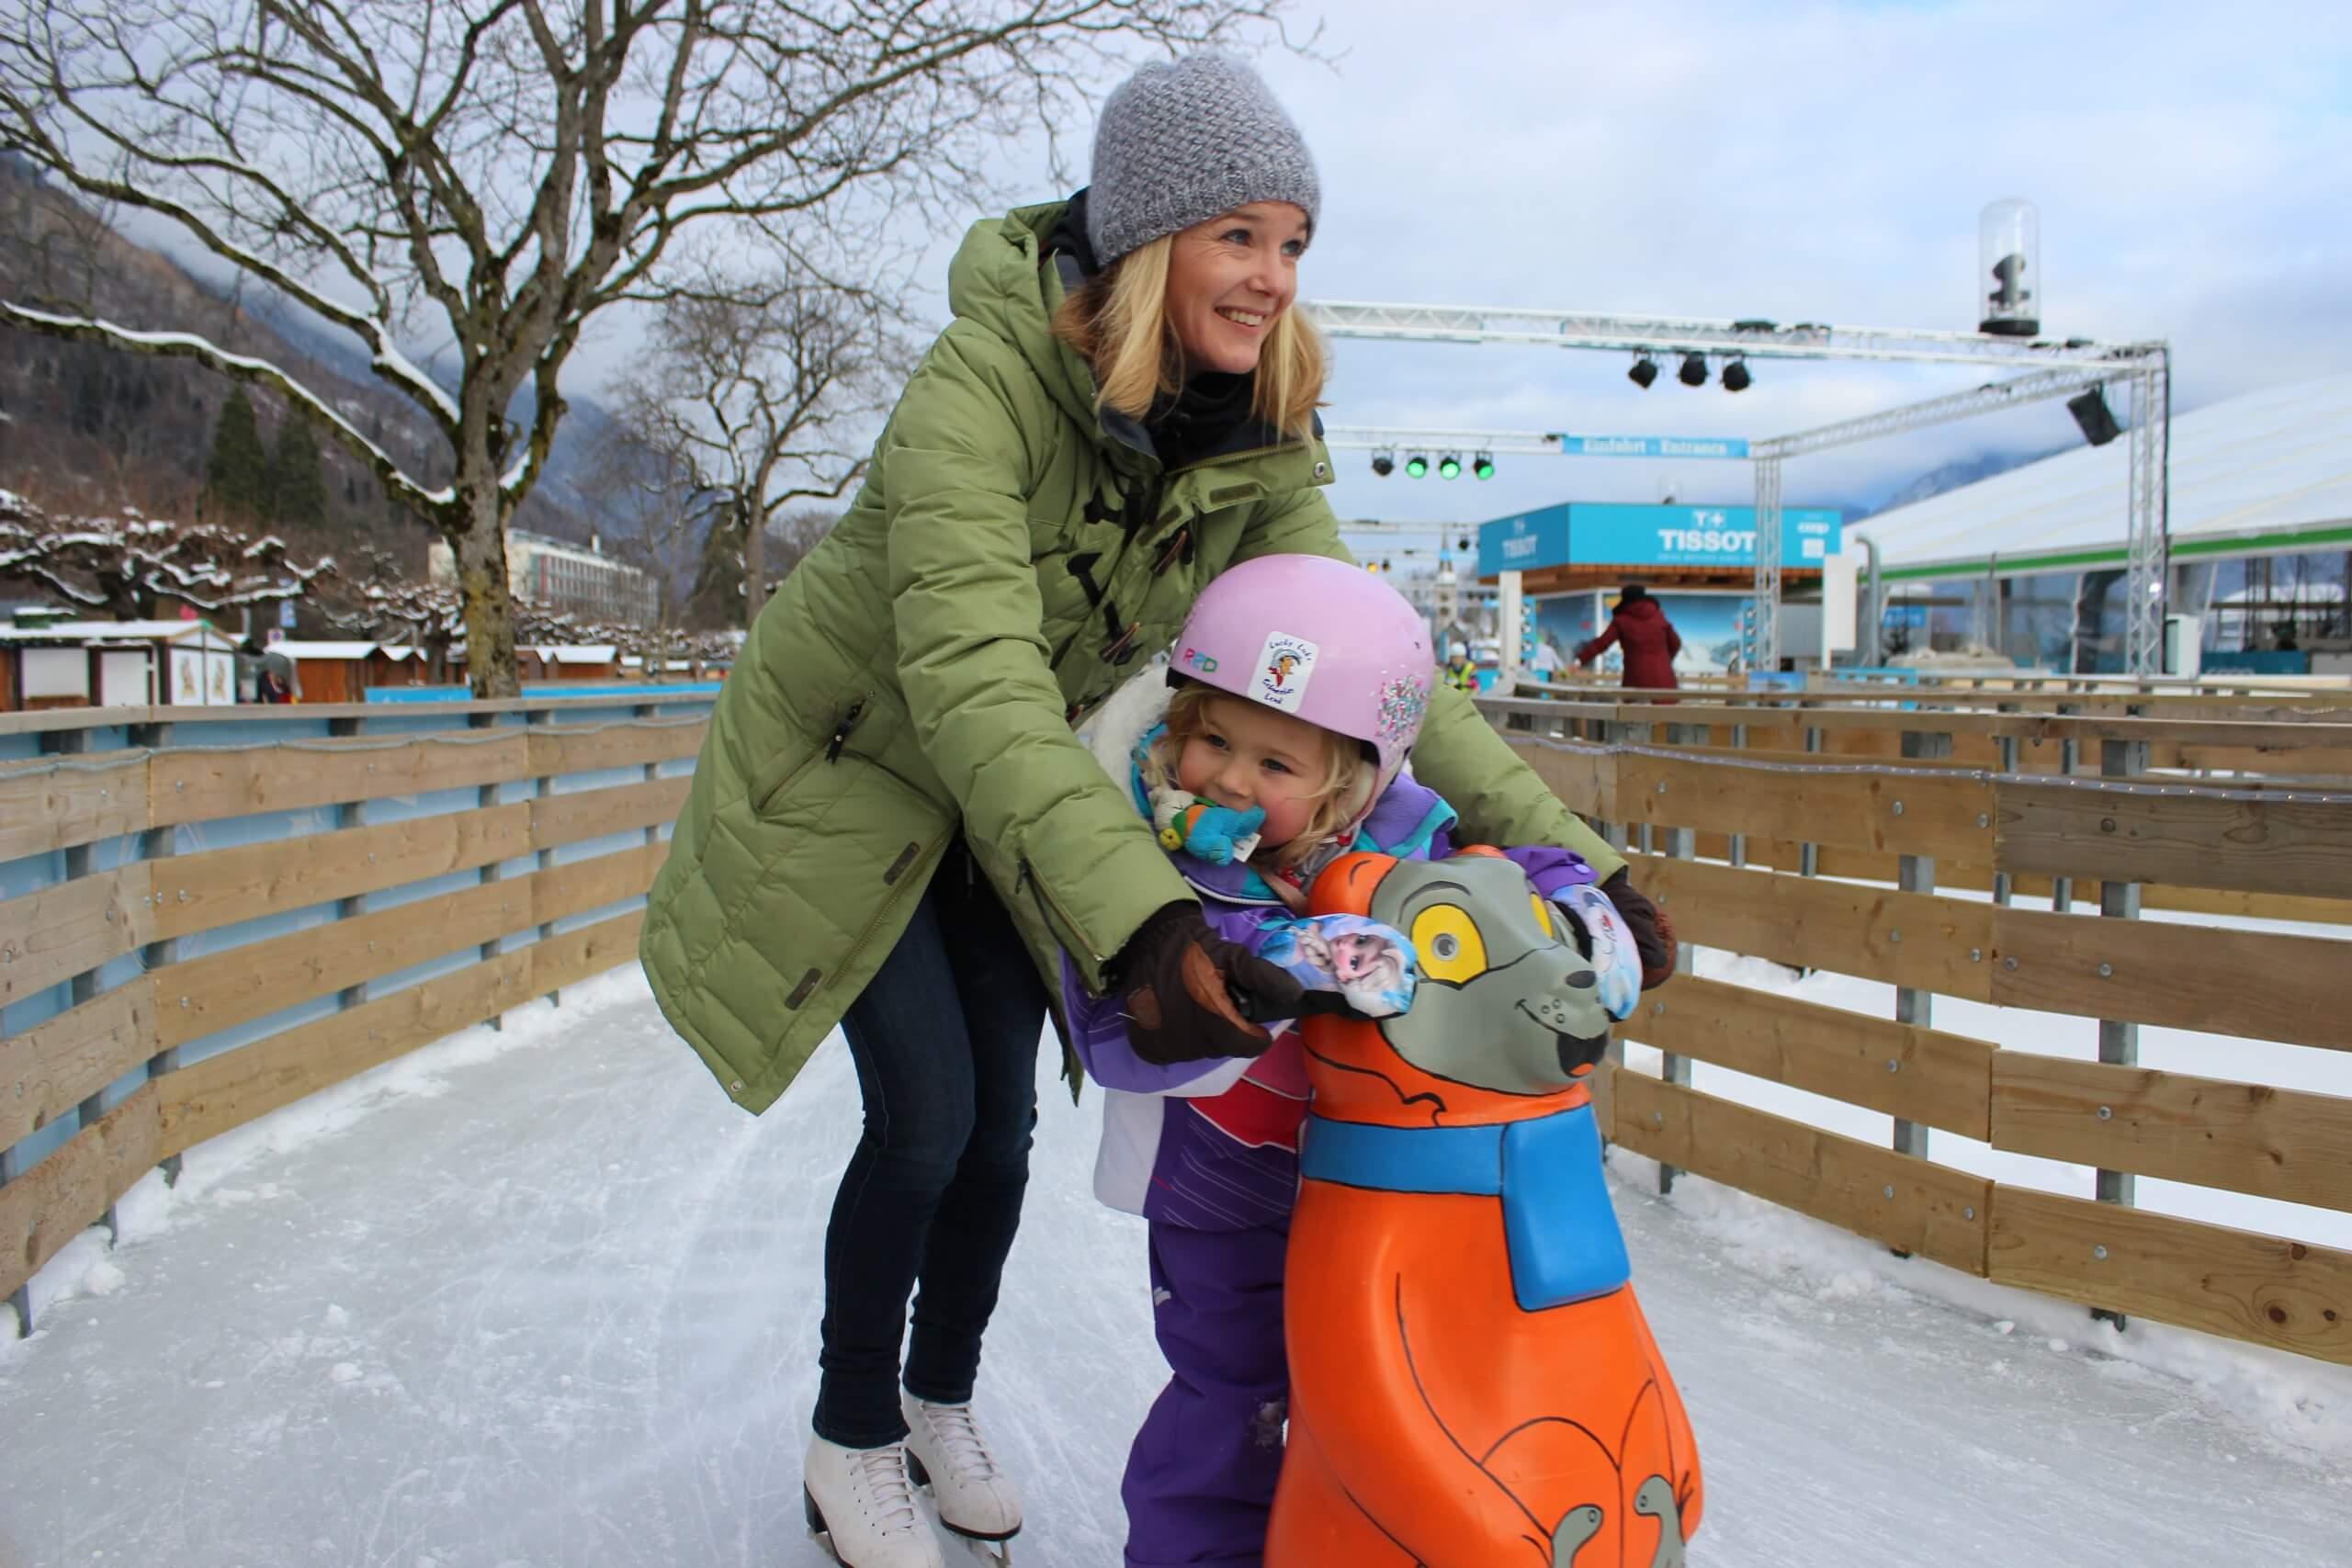 interlaken-top-of-europe-ice-magic-familie-schlittschuhlaufen-winter-eisweg-familienausfluege